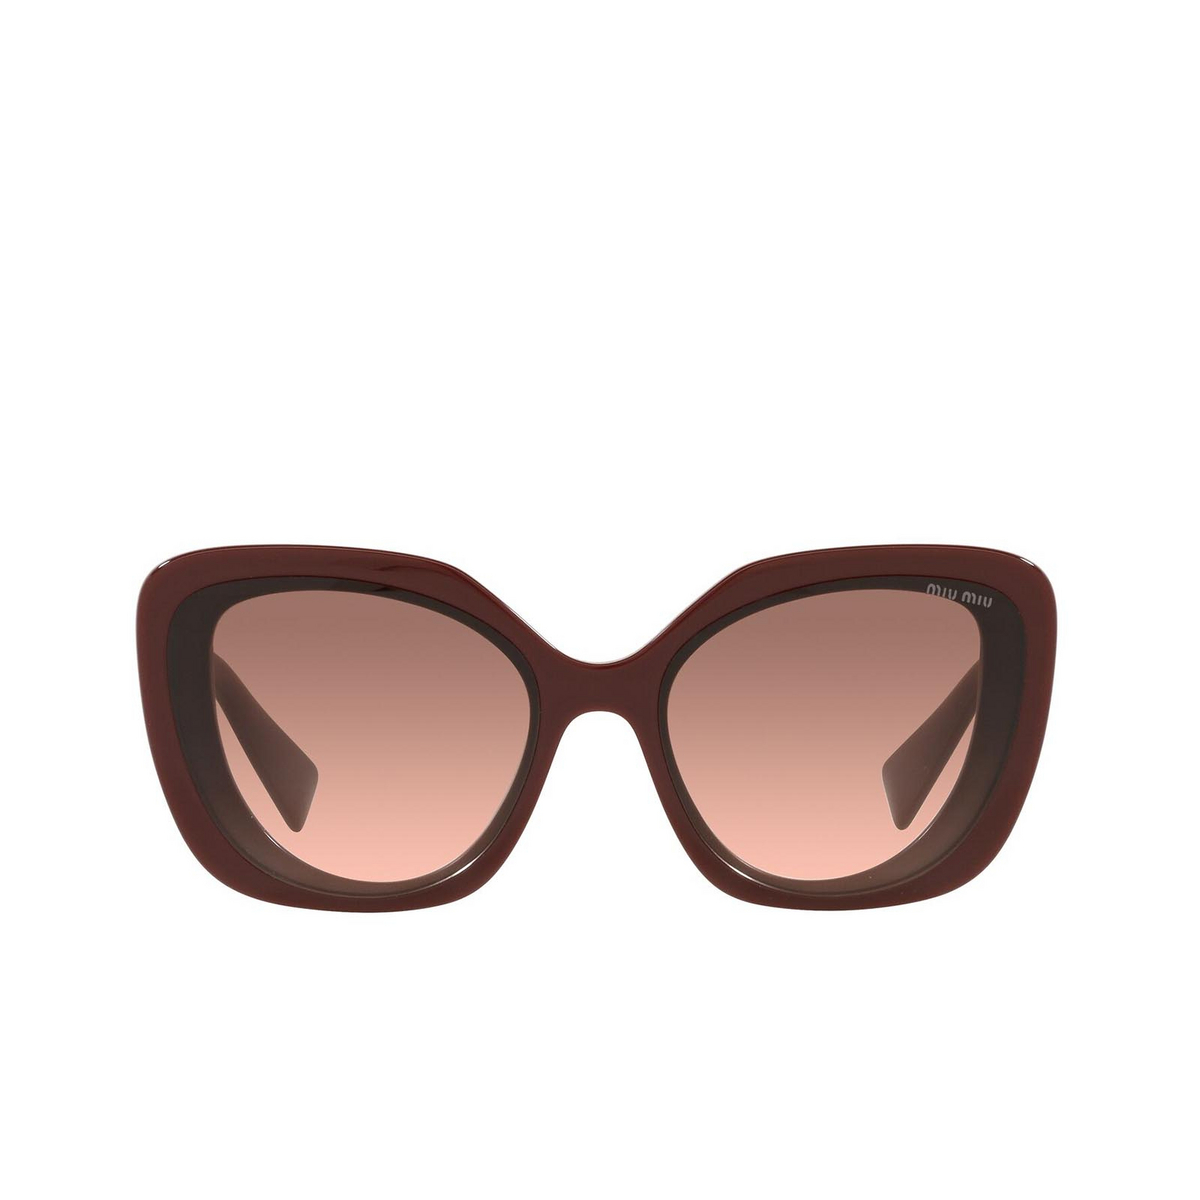 Miu Miu® Butterfly Sunglasses: MU 06XS color Pink Bordeaux 01T0A5.